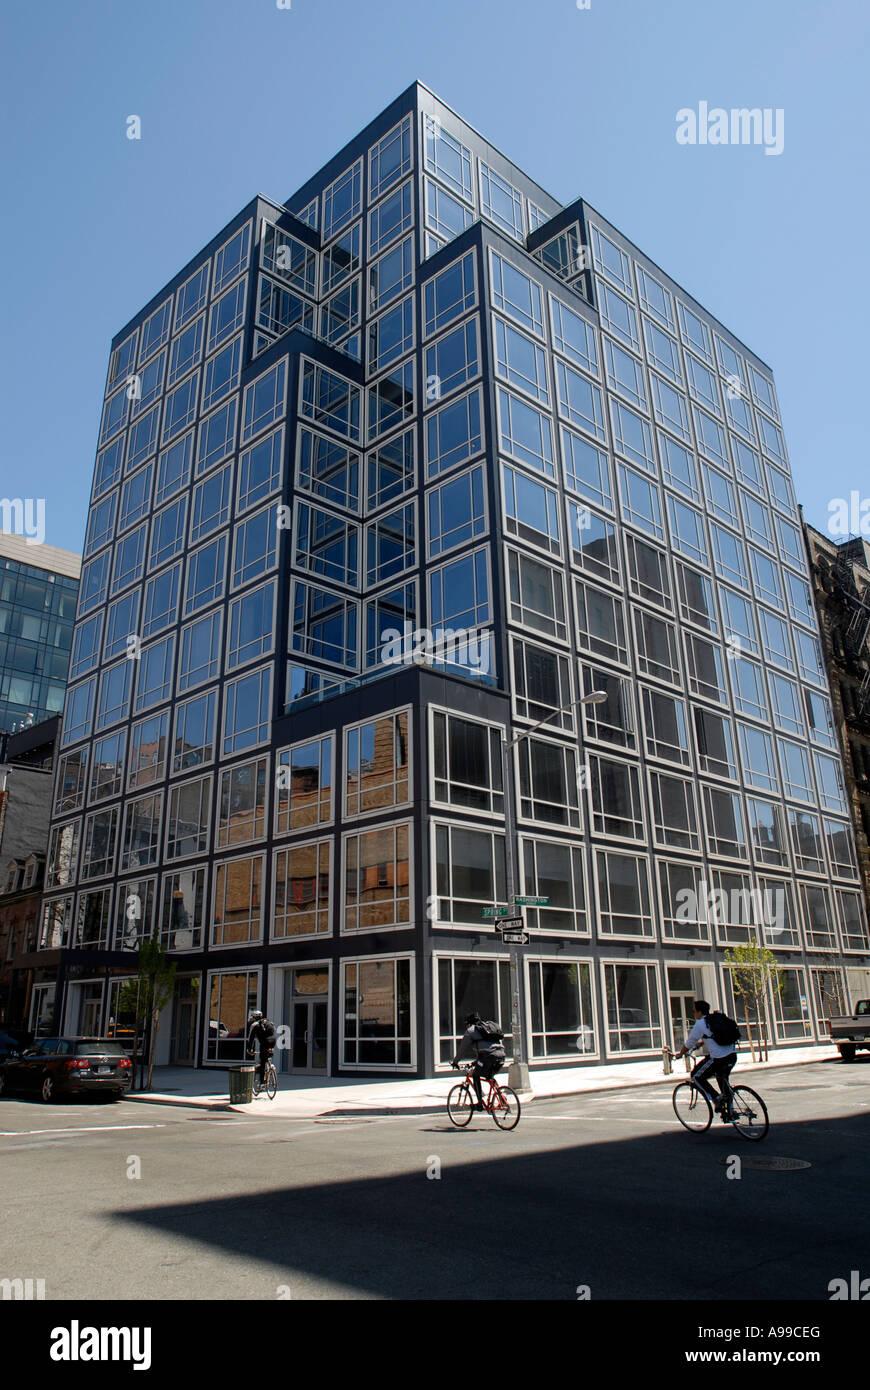 Philip Johnson Glass House philip johnson s urban glass house on spring street in new